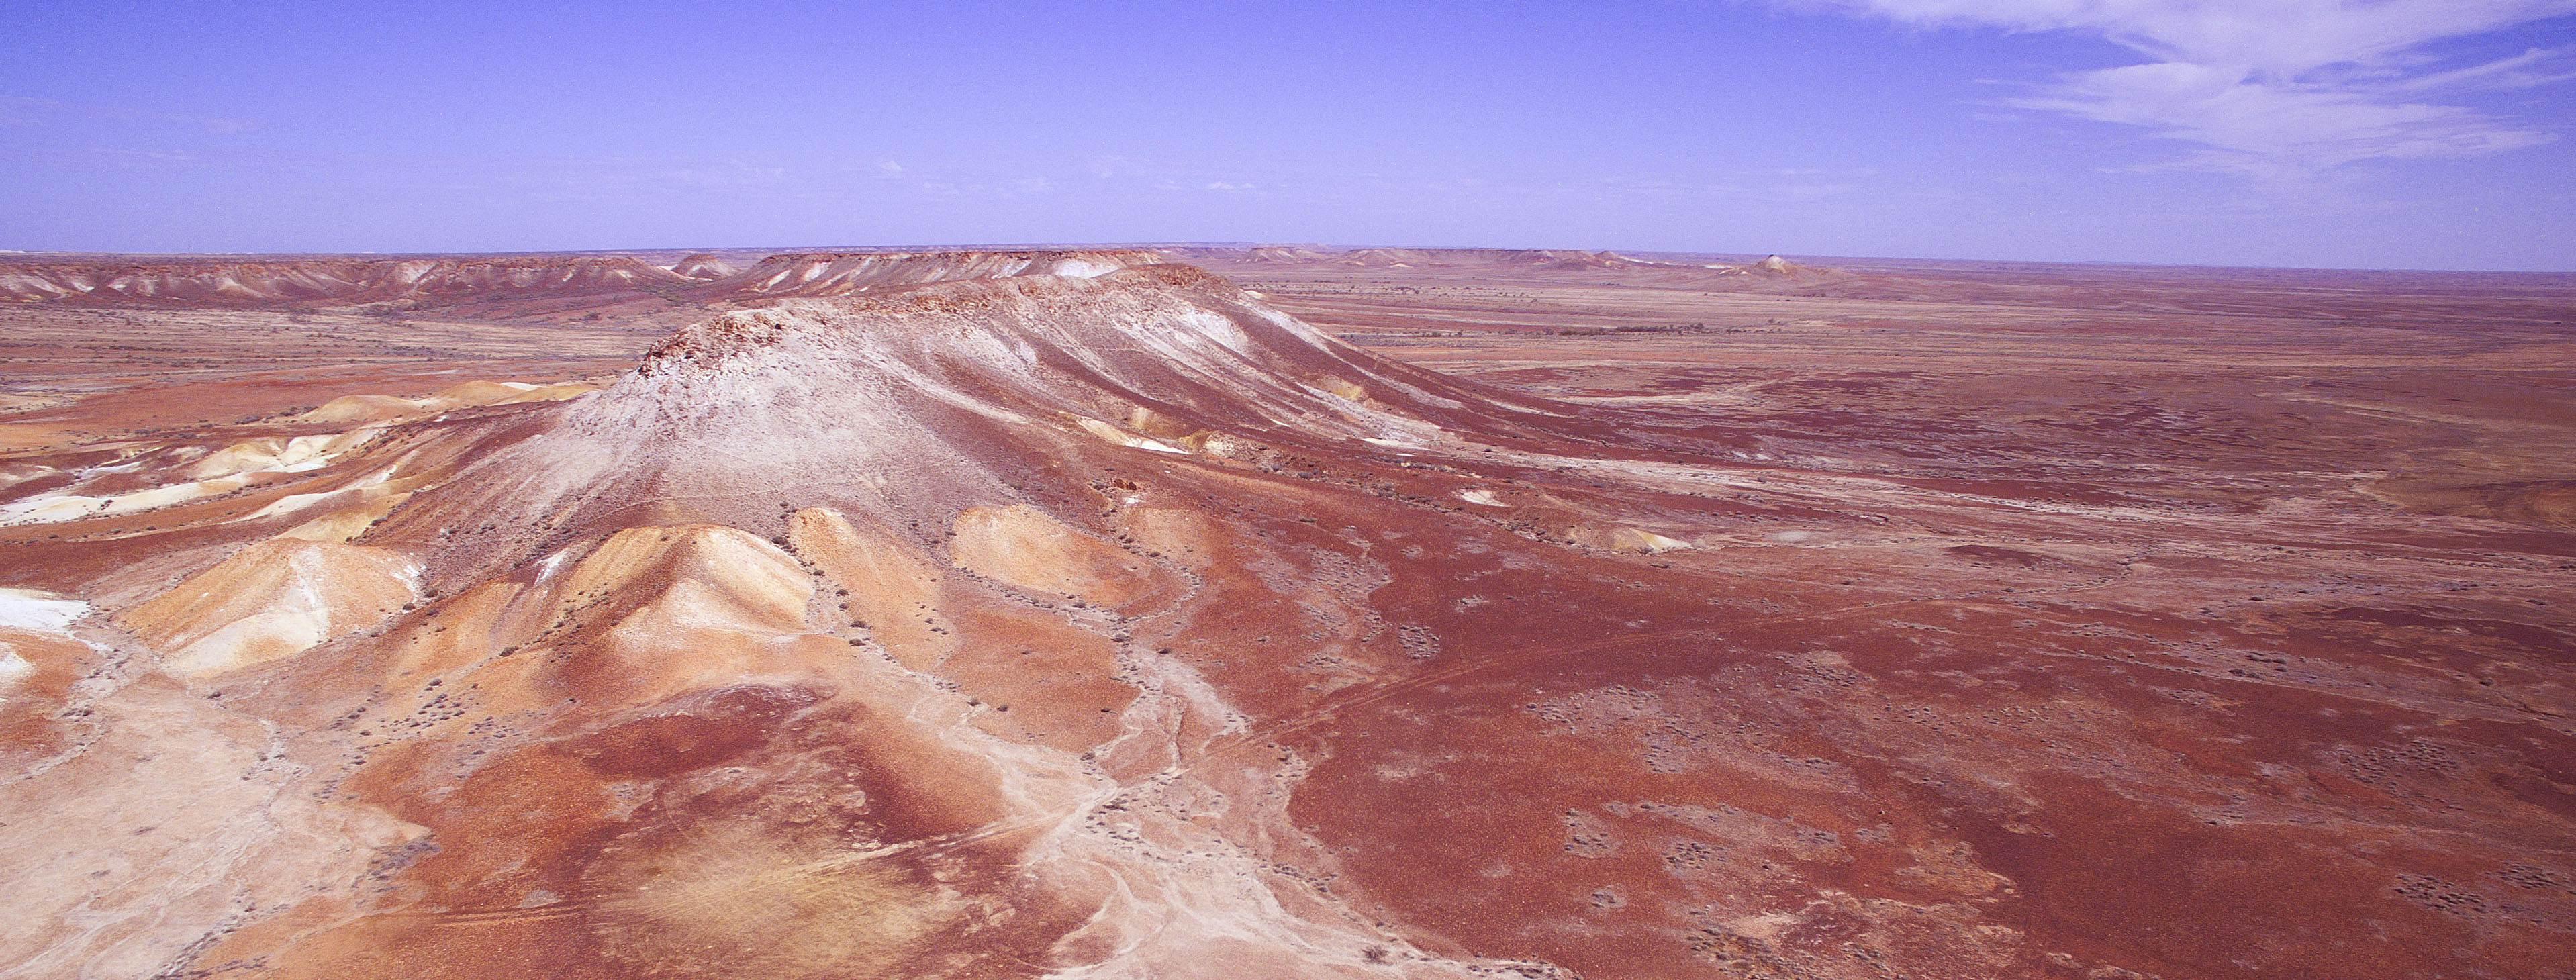 desert drone site